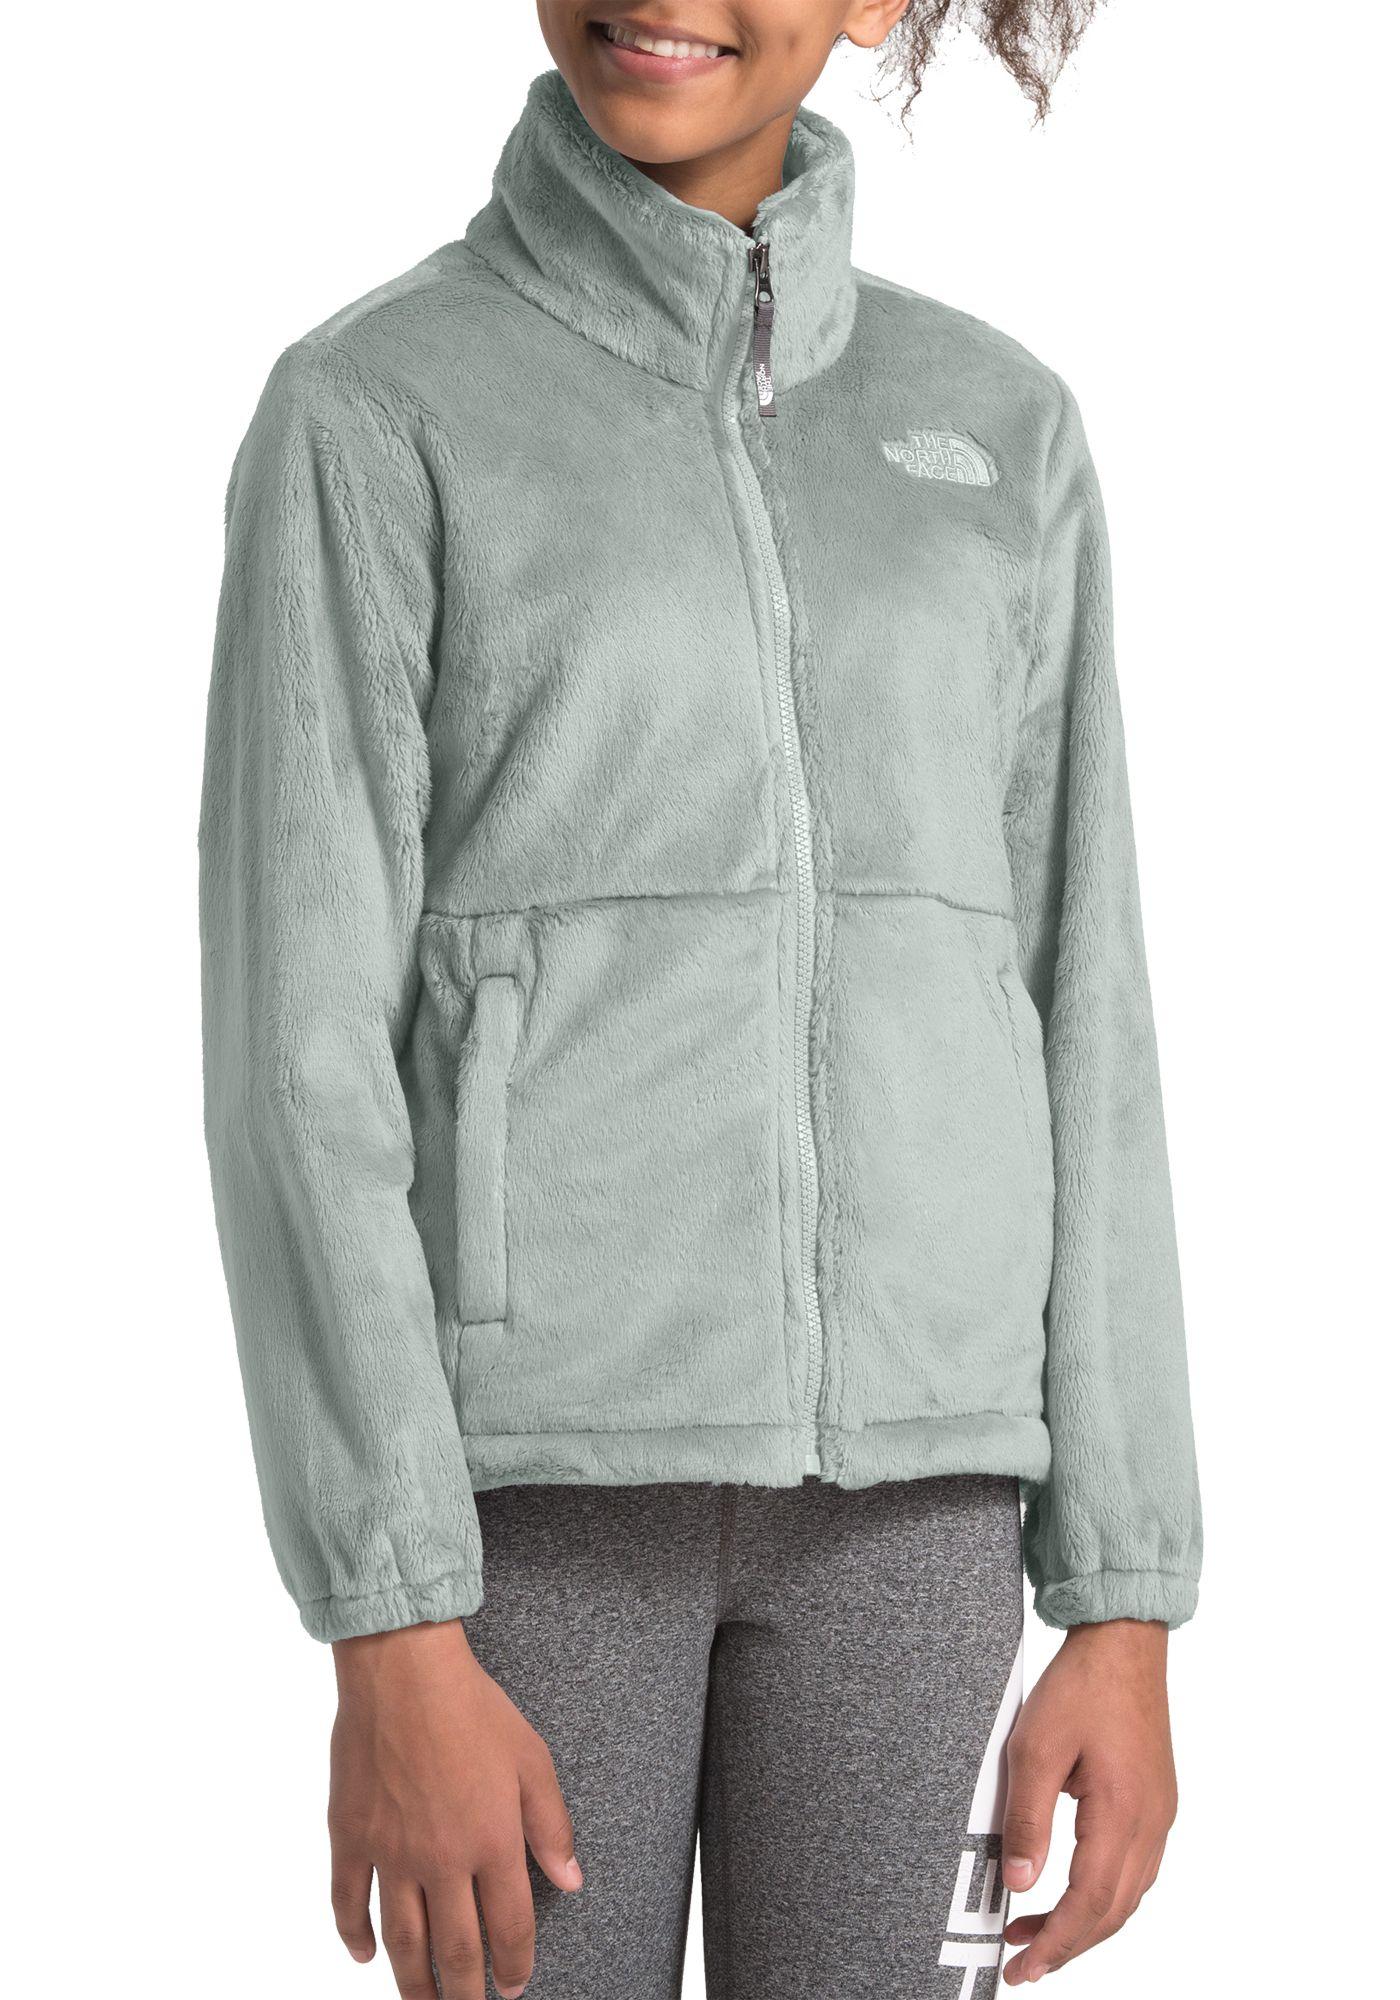 The North Face Girls' Osolita Fleece Jacket